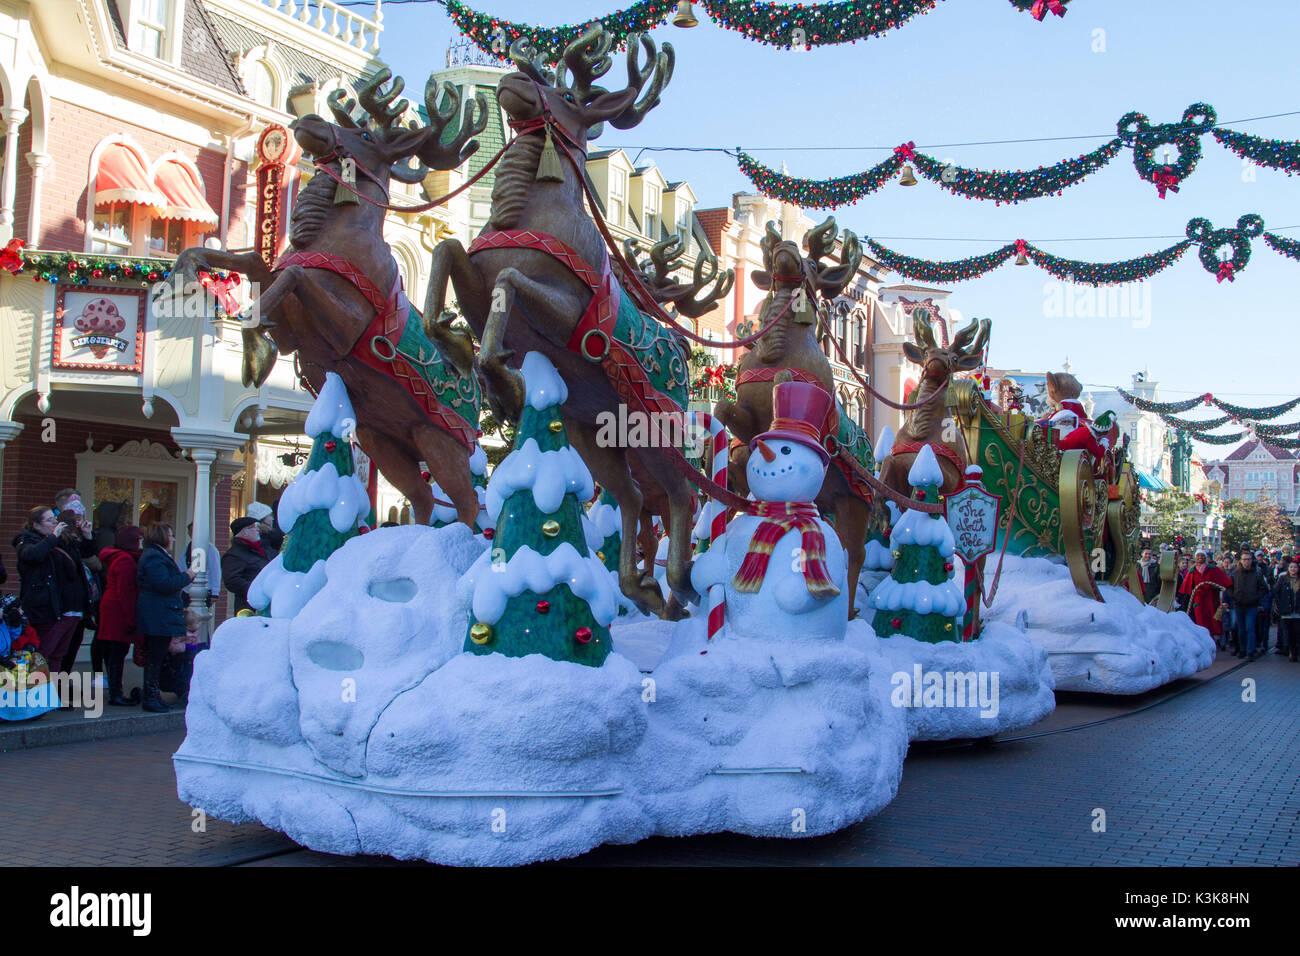 Christmas Parade:In Palos Verdes December 1, 2021